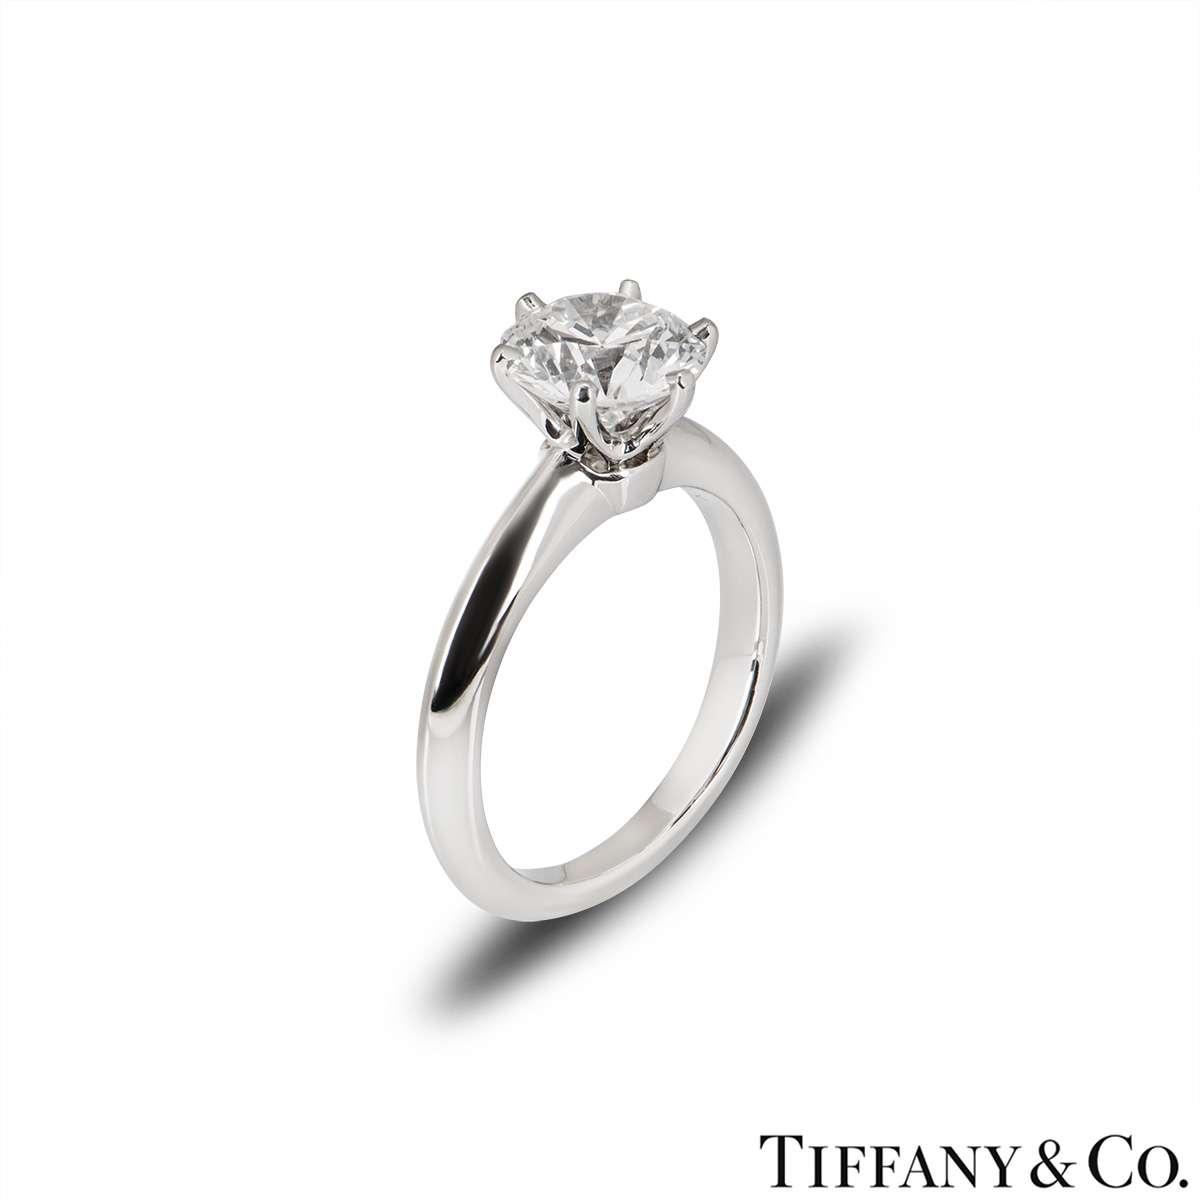 Tiffany & Co. Platinum Diamond Setting Ring 1.53ct G/VVS2 XXX